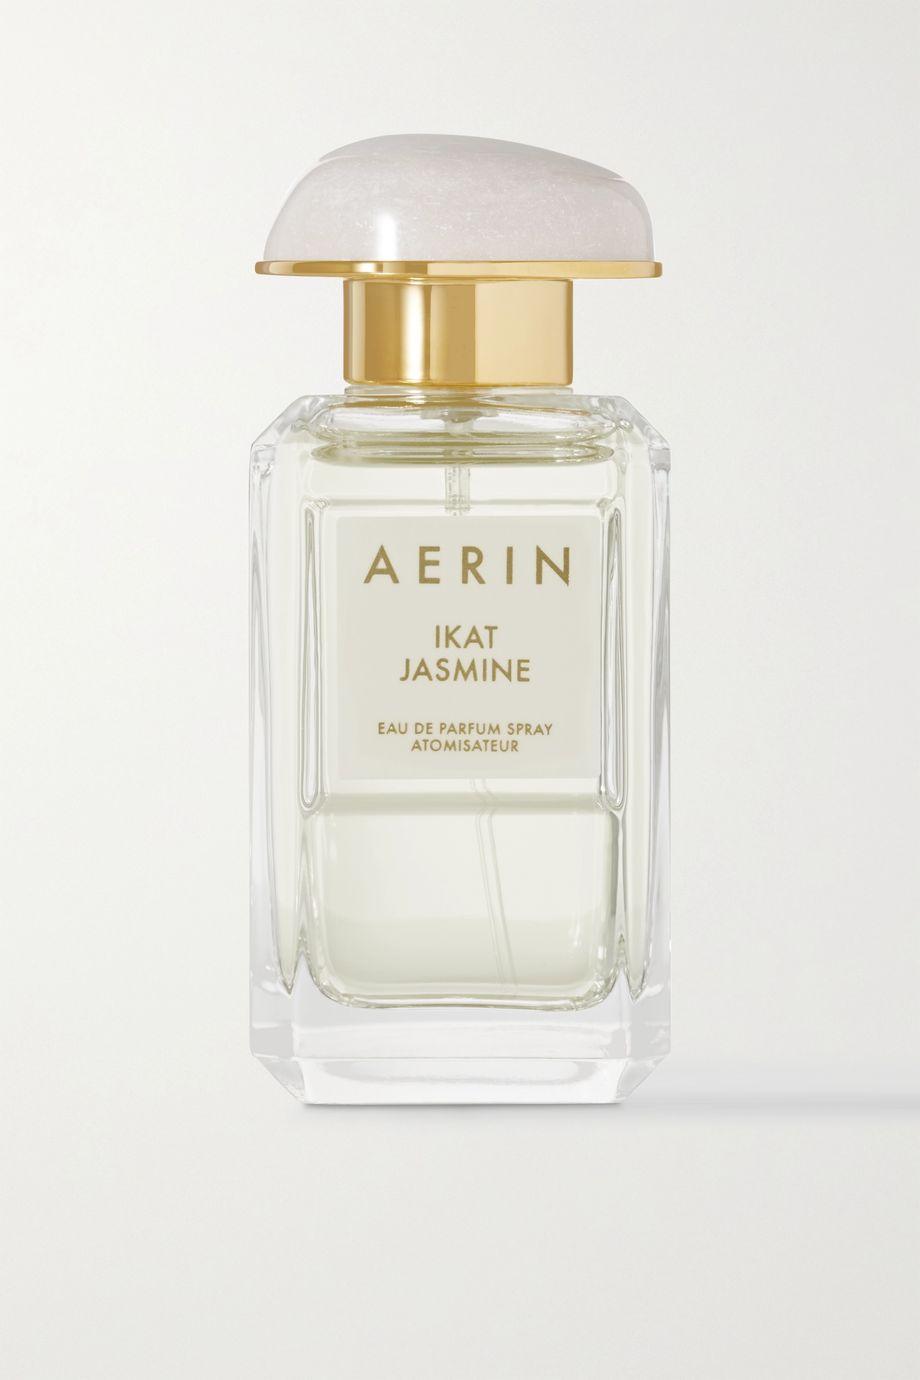 AERIN Beauty Ikat Jasmine – Ägyptischer Jasmin & Tuberose, 50 ml – Eau de Parfum